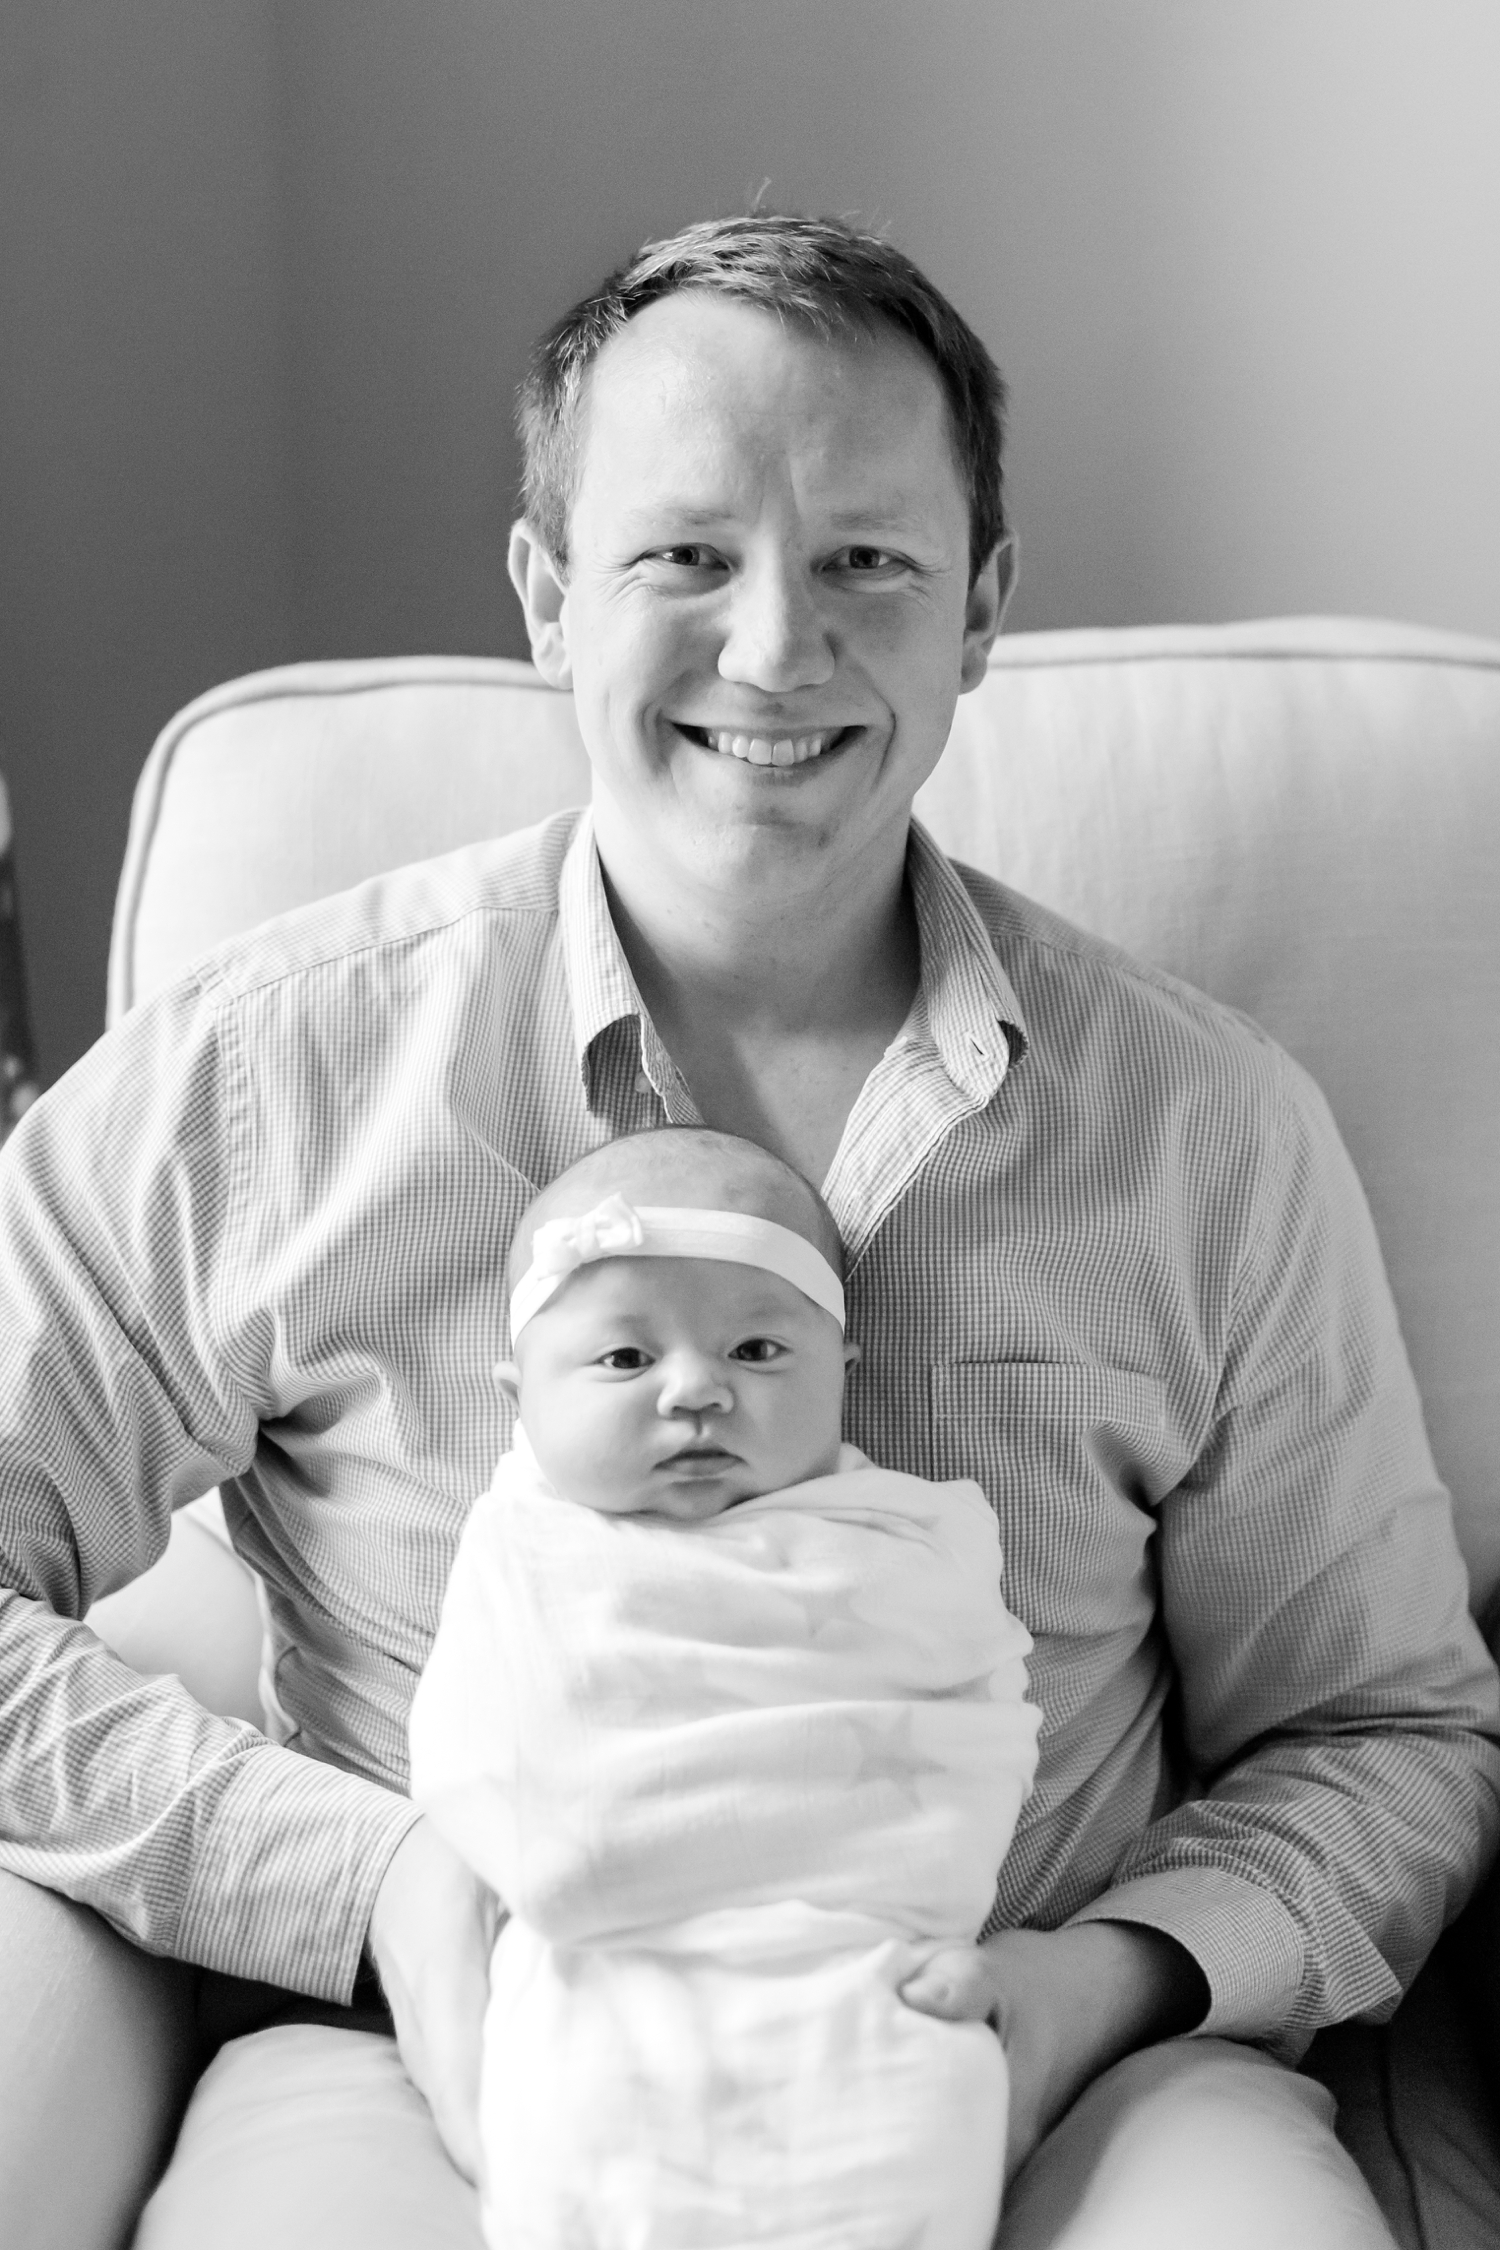 DeVilbiss Newborn-183_maryland-newborn-and-family-photographer-anna-grace-photography-photo.jpg